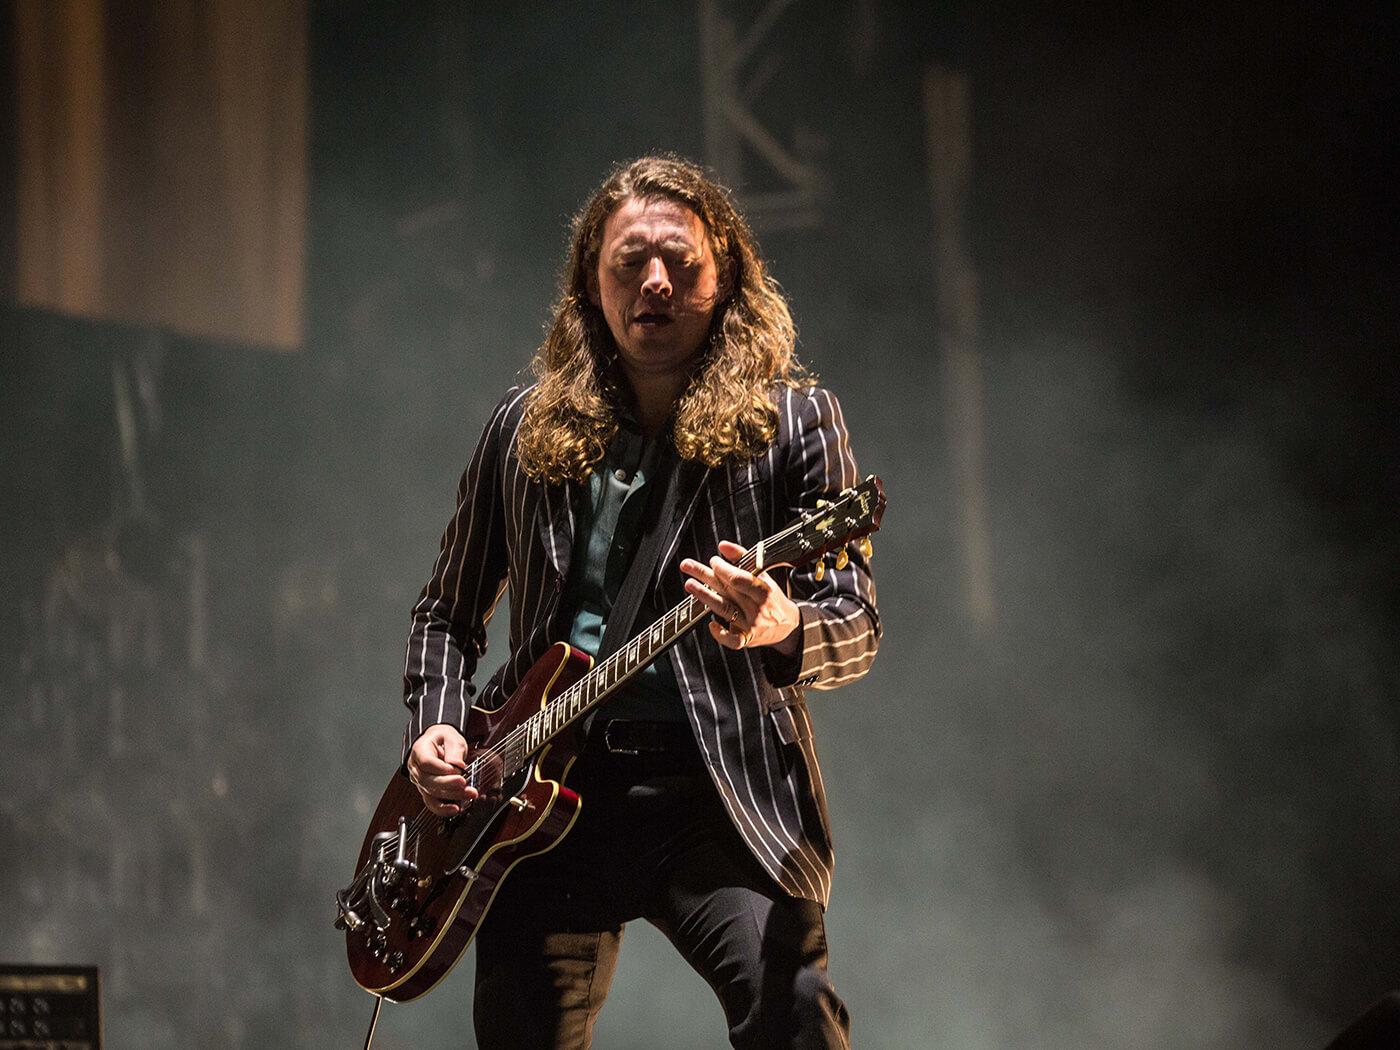 Jamie Cook of Arctic Monkeys